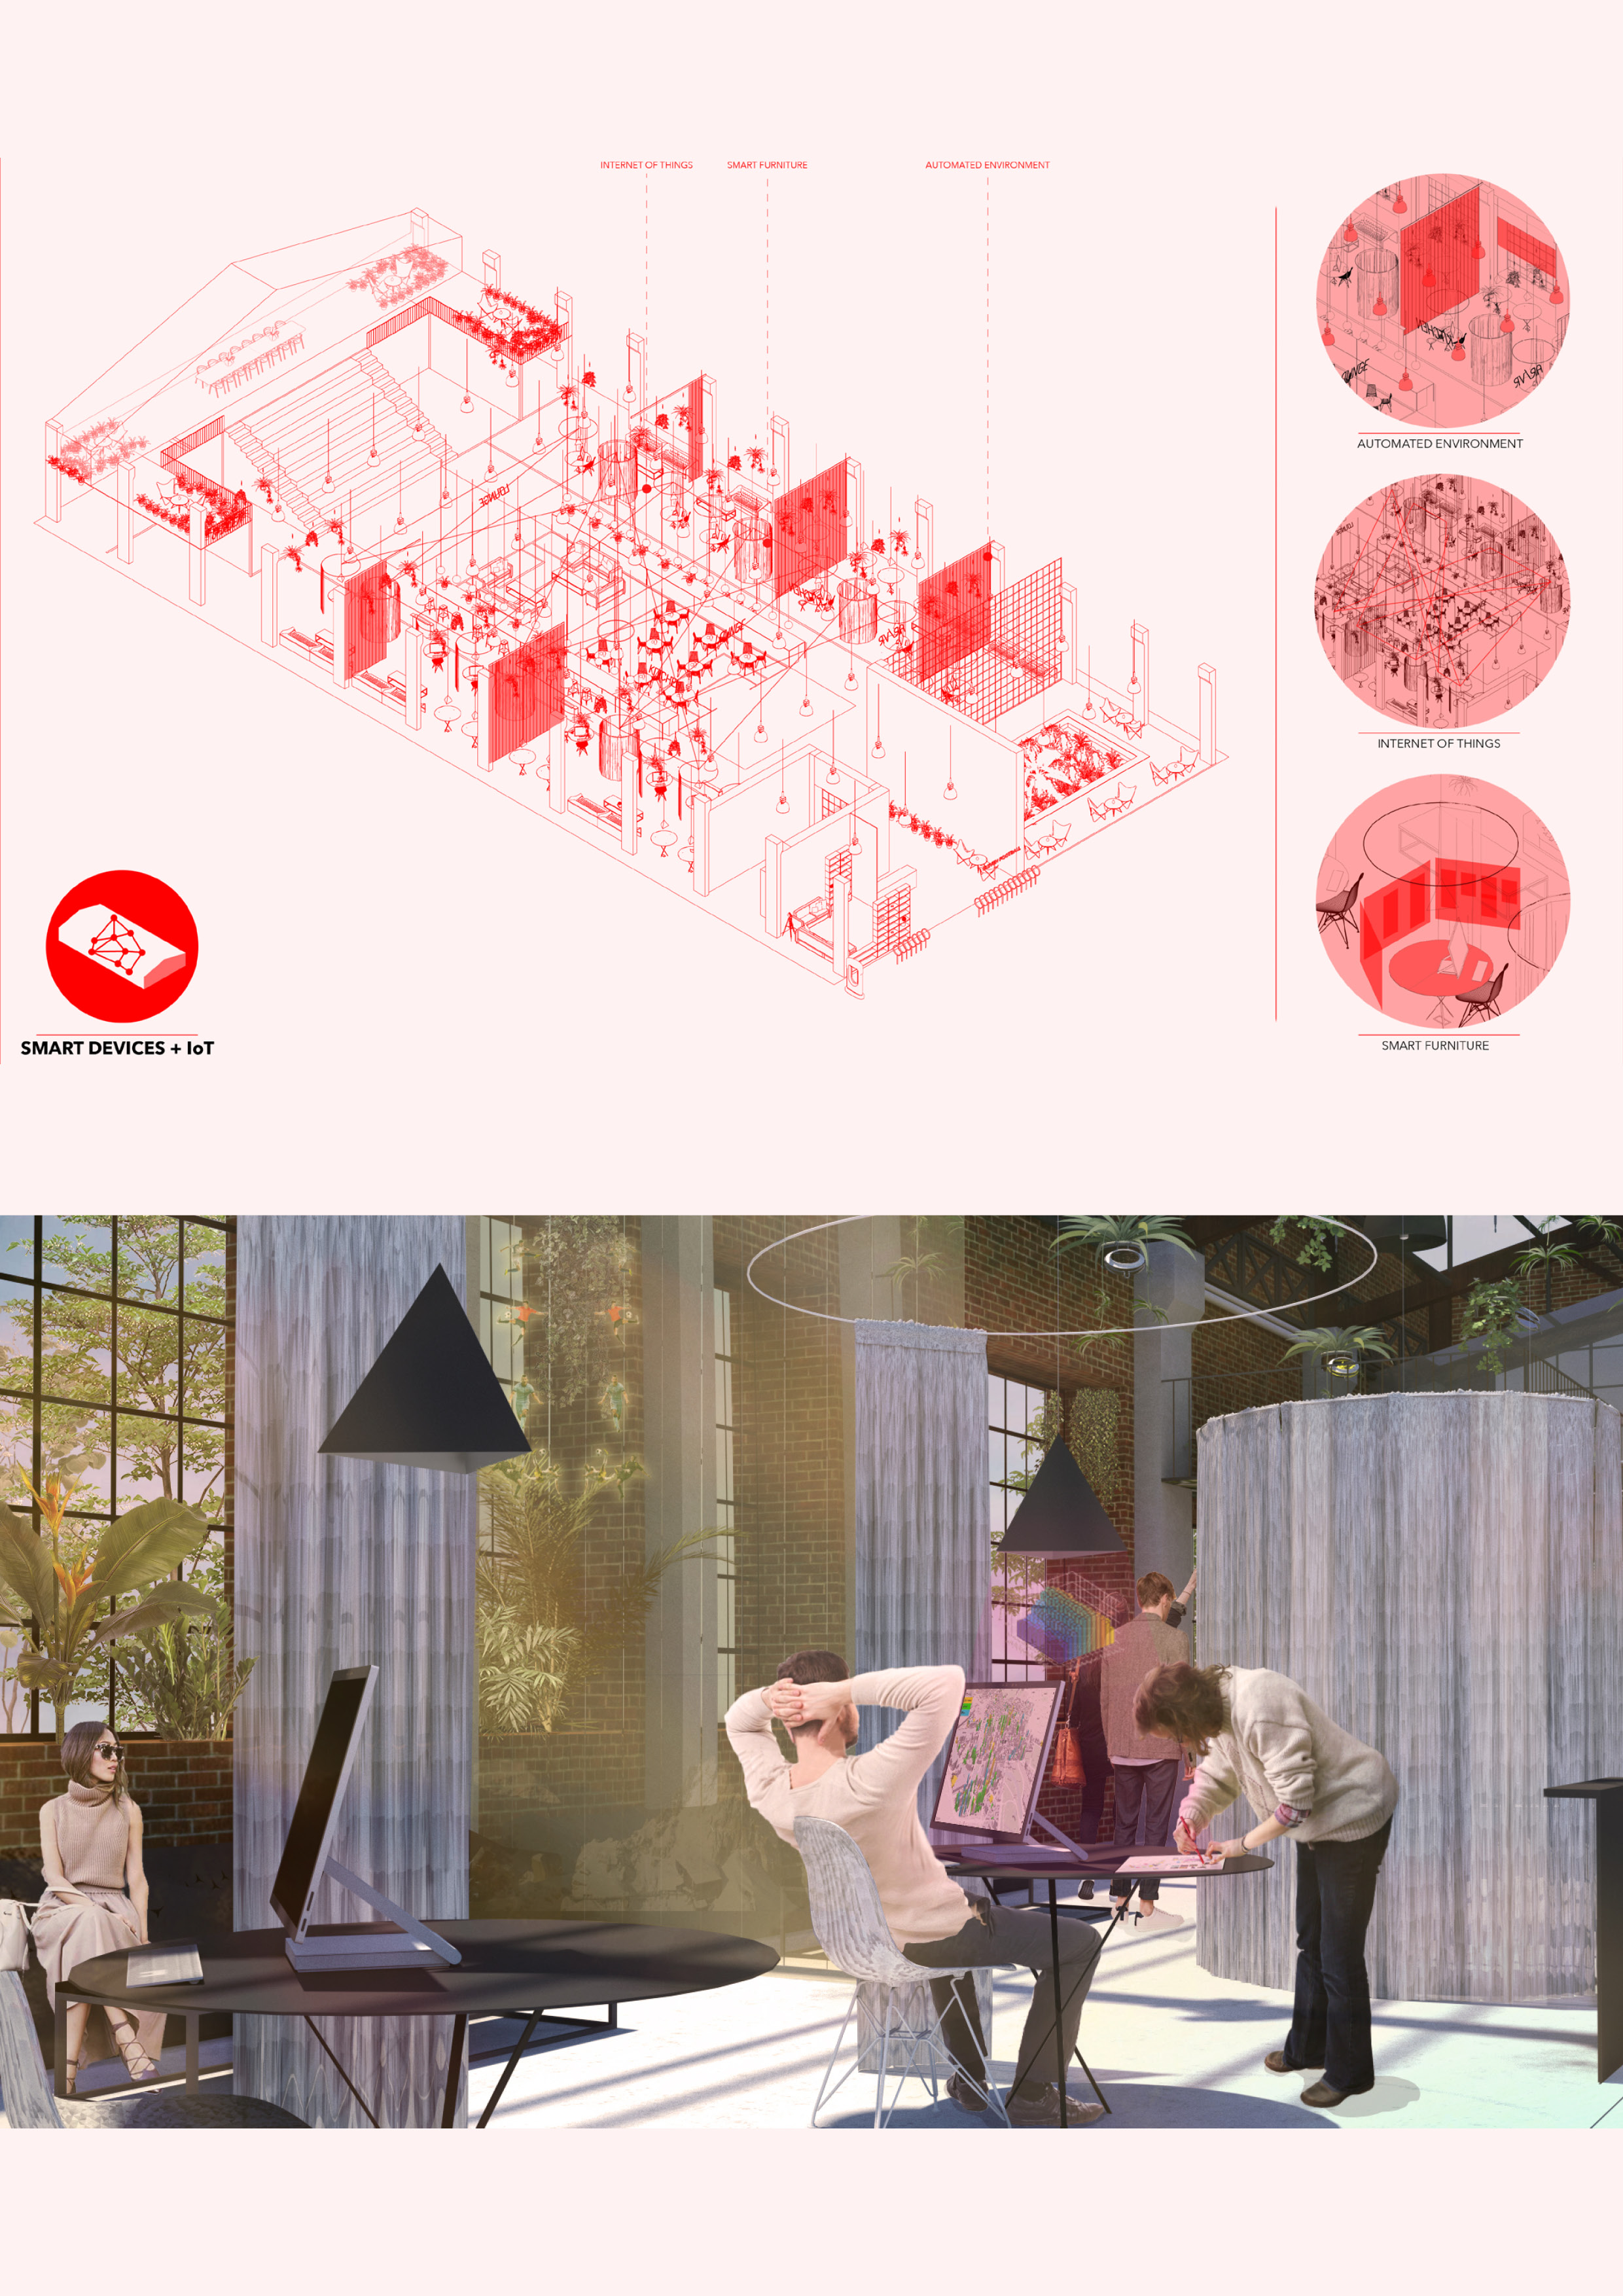 Atelier Aitken Modern Workplace design - Smart devices and IOT.jpg